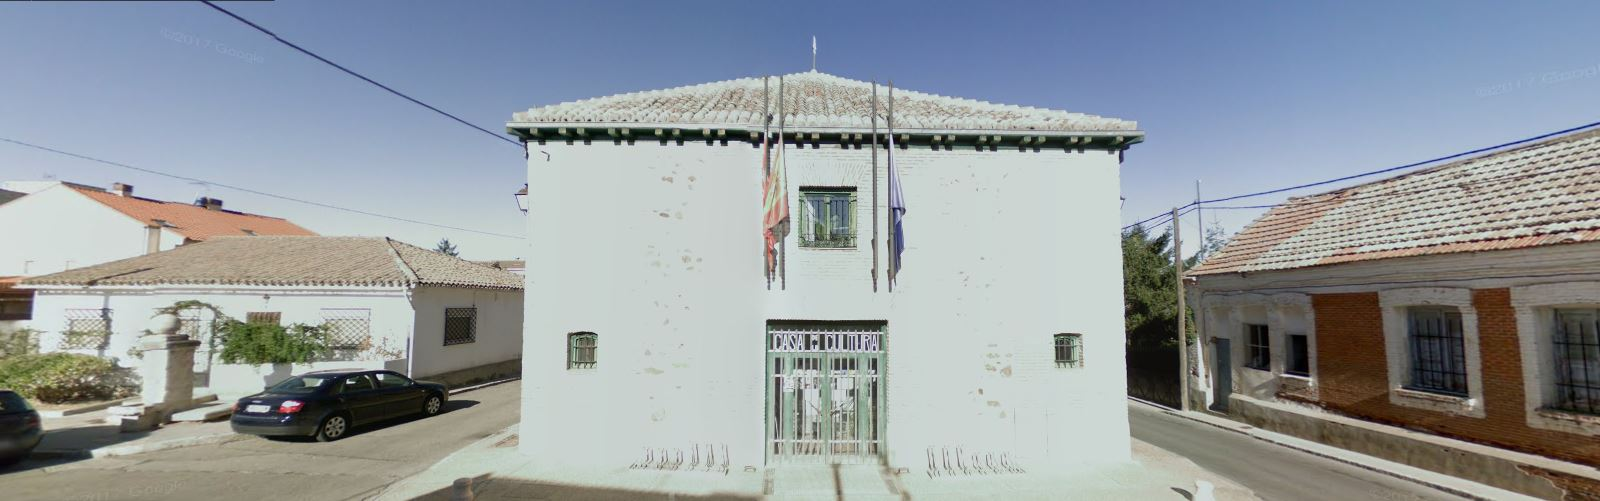 Registro civil - Juzgado de Paz Talamanca de Jarama